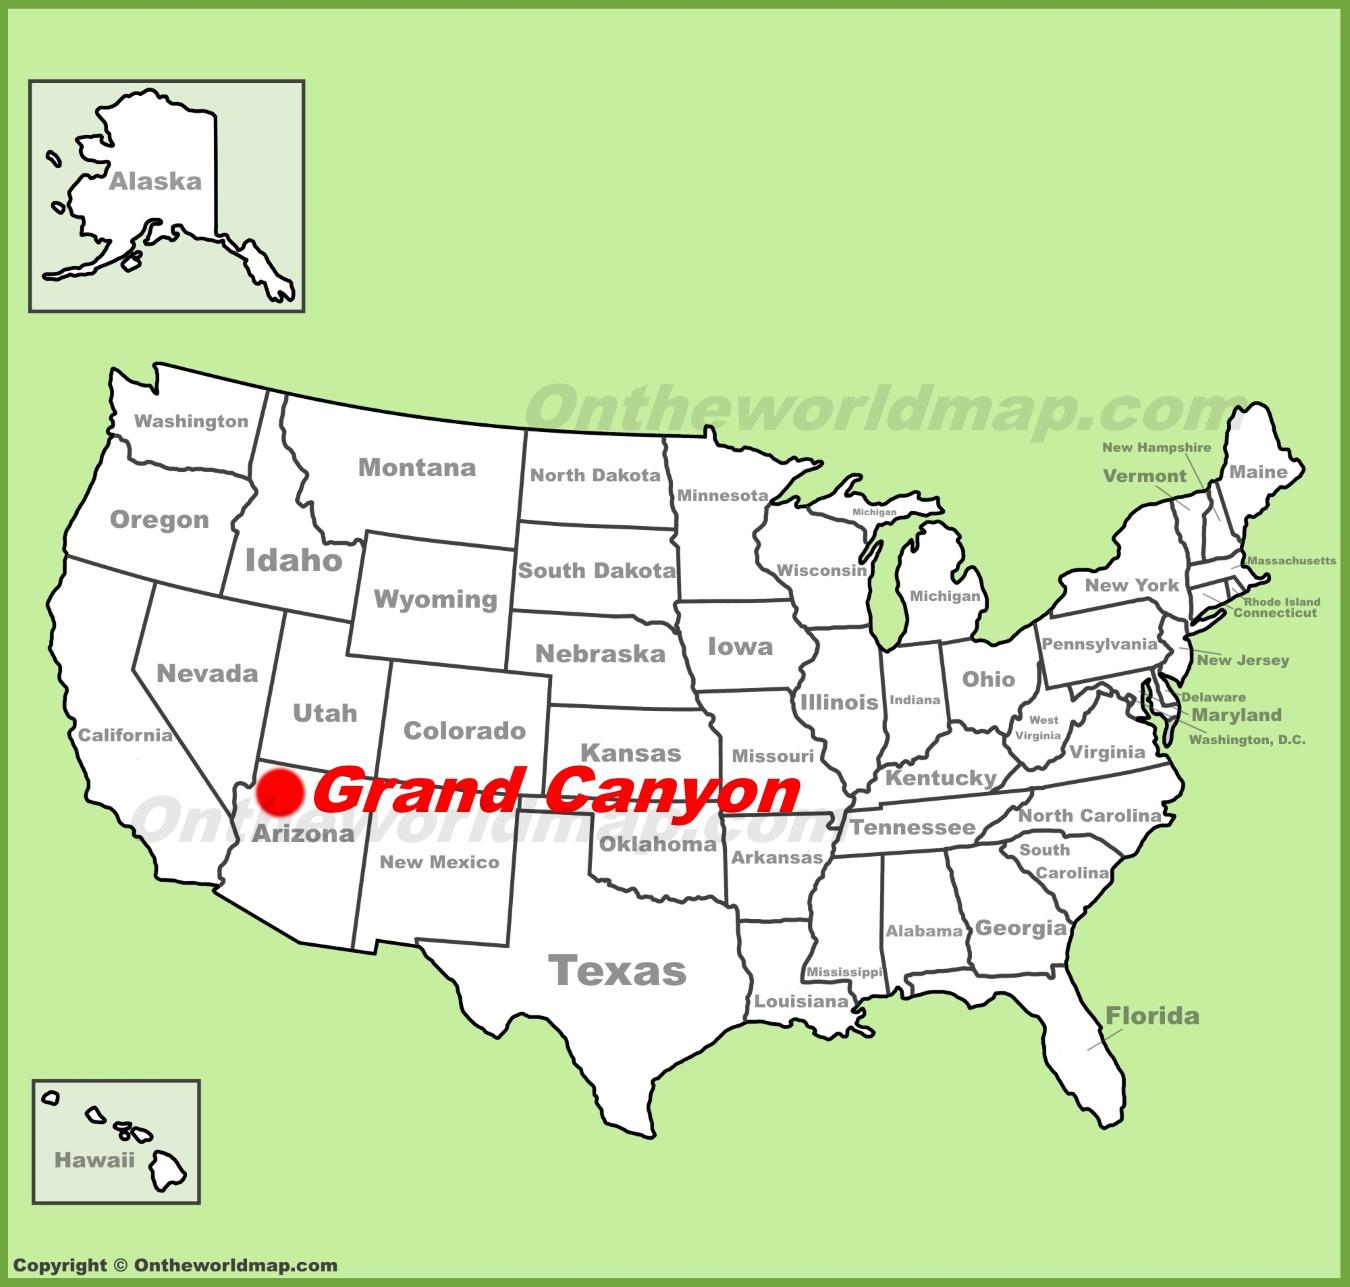 Grand Canyon On Map Grand Canyon Maps | USA | Maps of Grand Canyon National Park